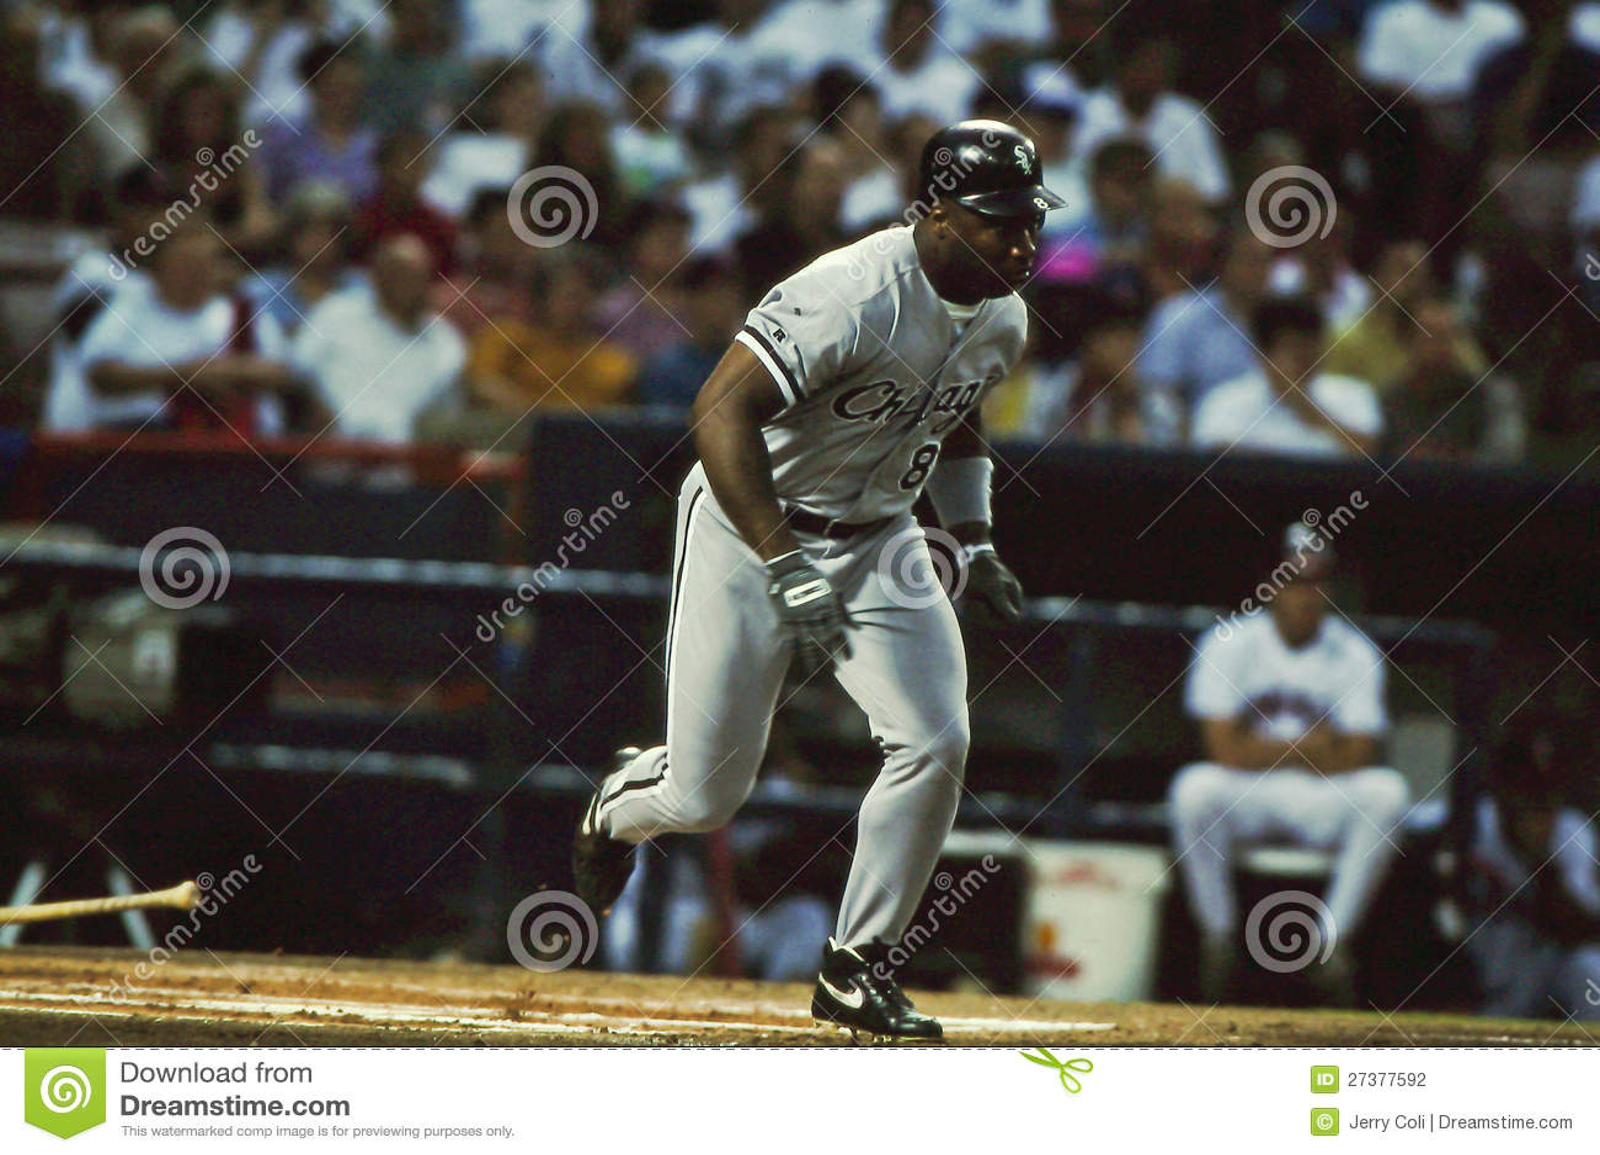 official photos 6bca9 af531 Bo Jackson Chicago White Sox Editorial Photography - Image ...